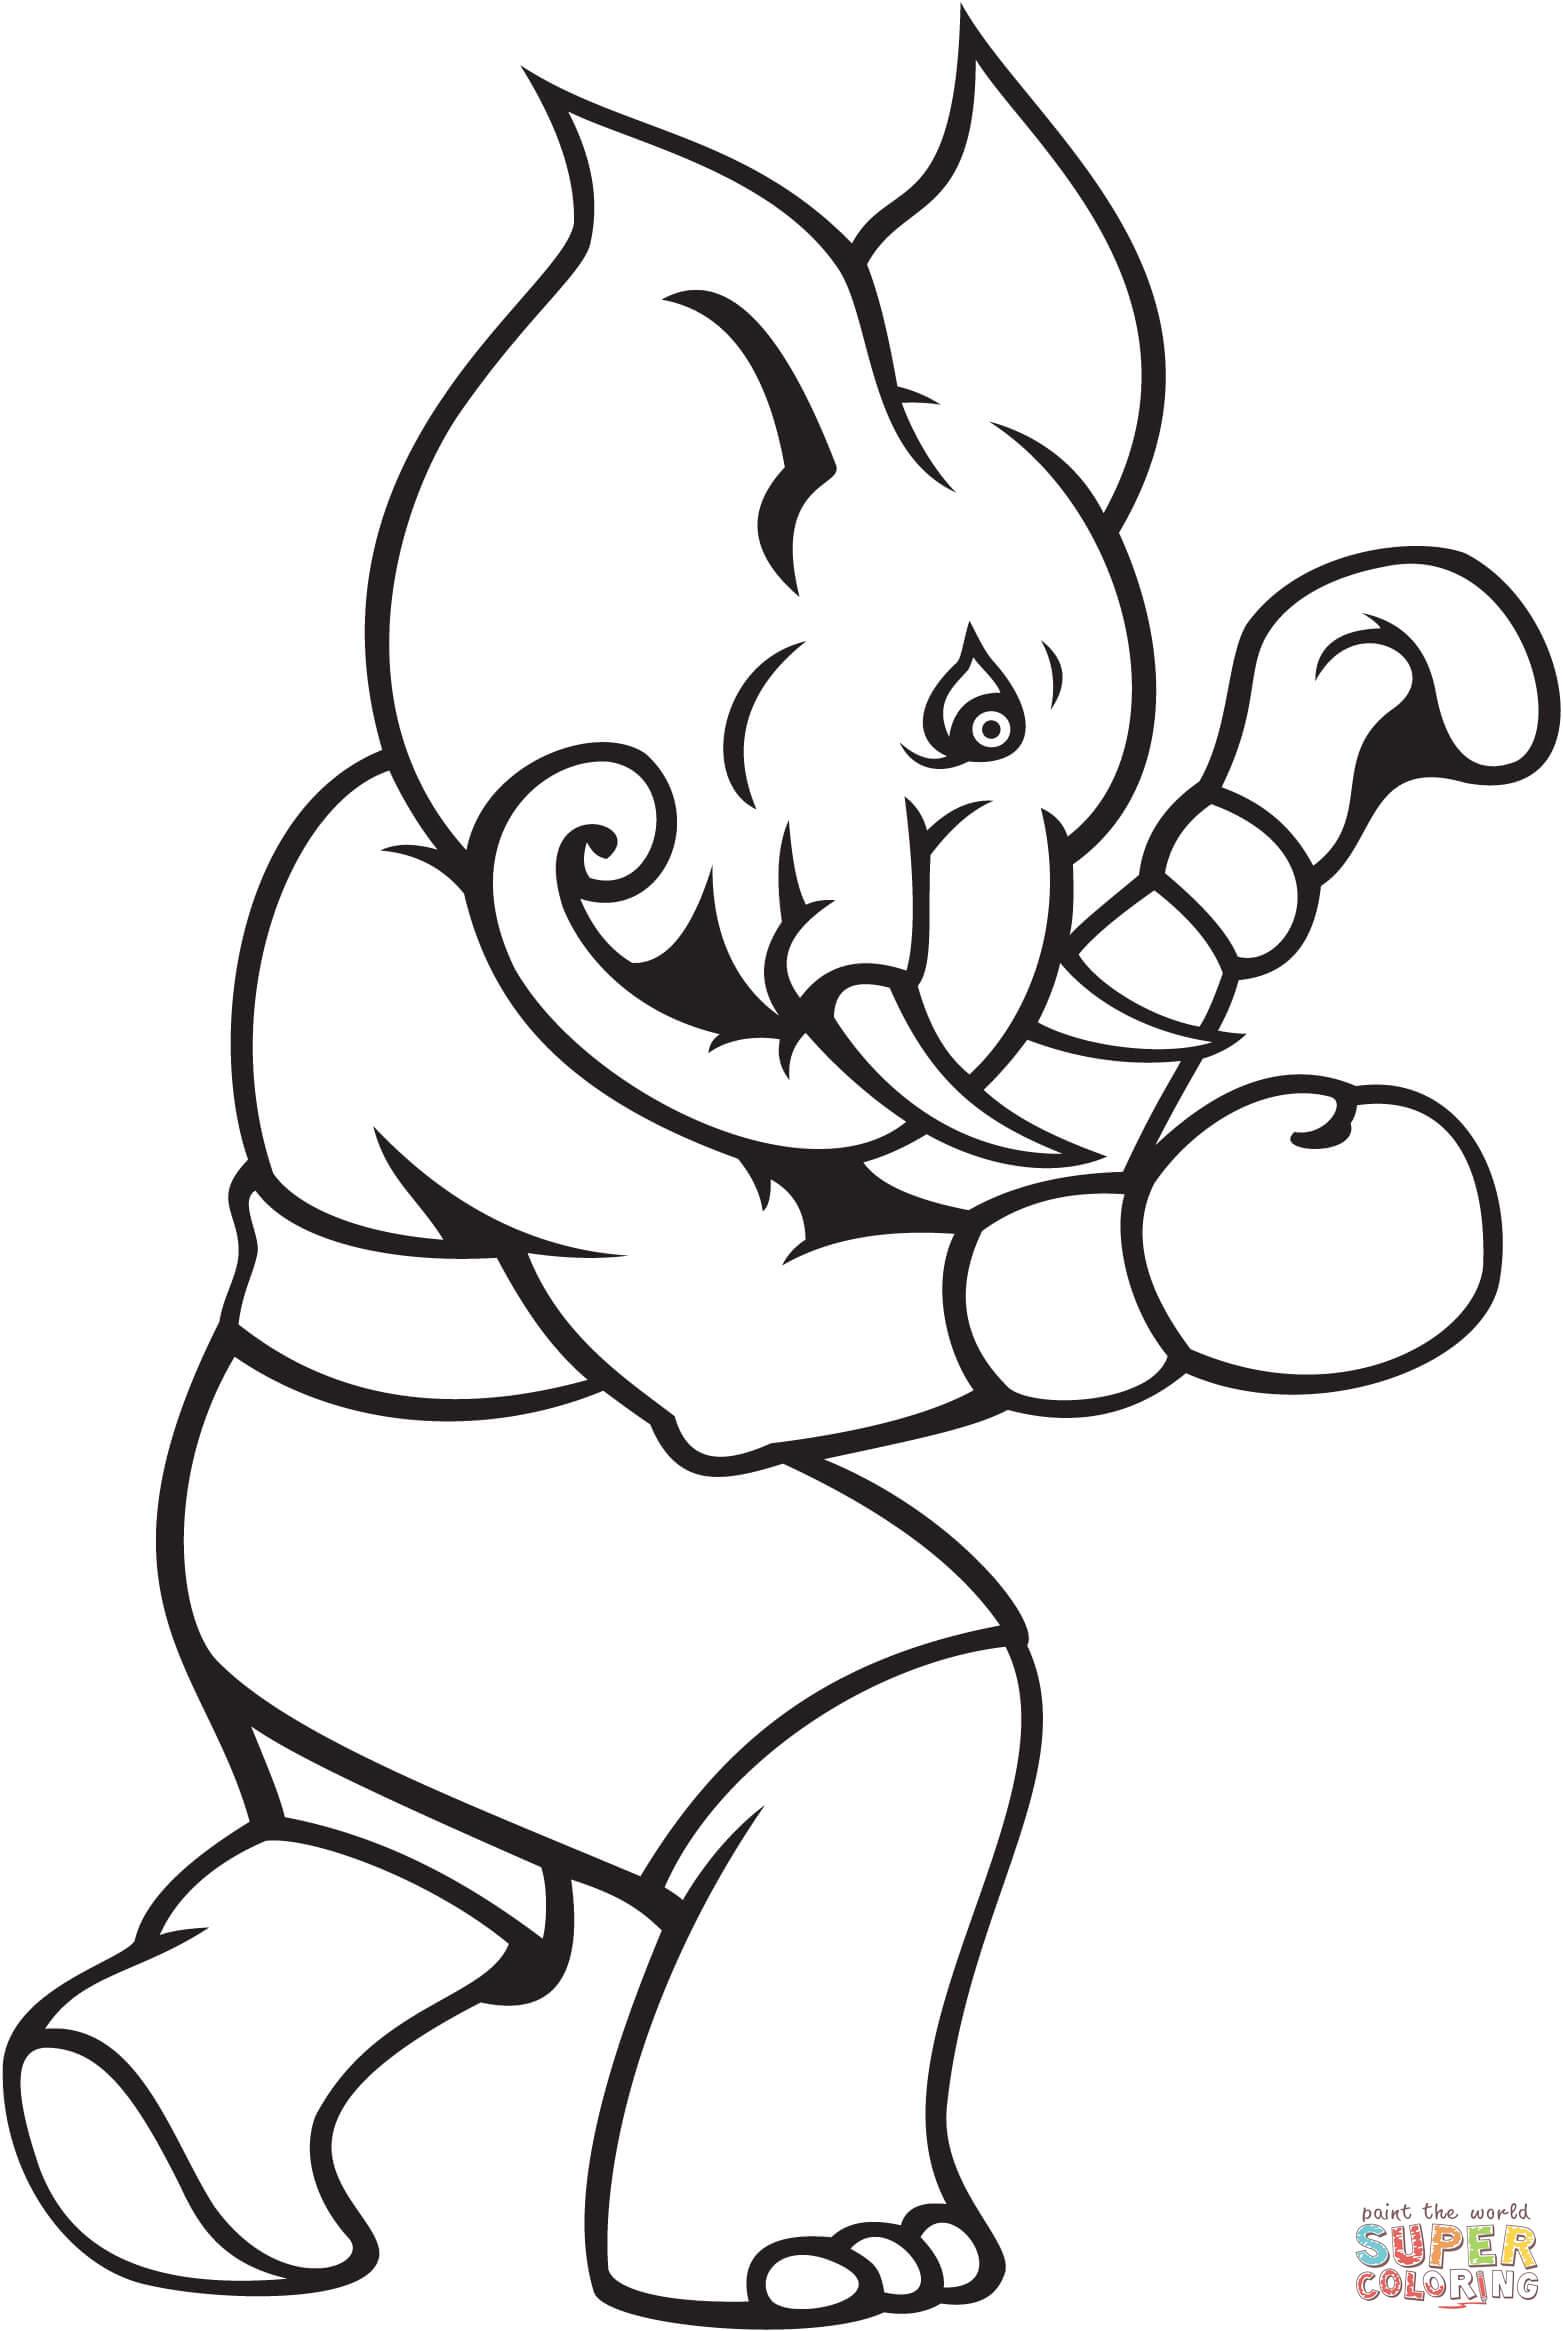 Boxing Coloring Pages - Kidsuki